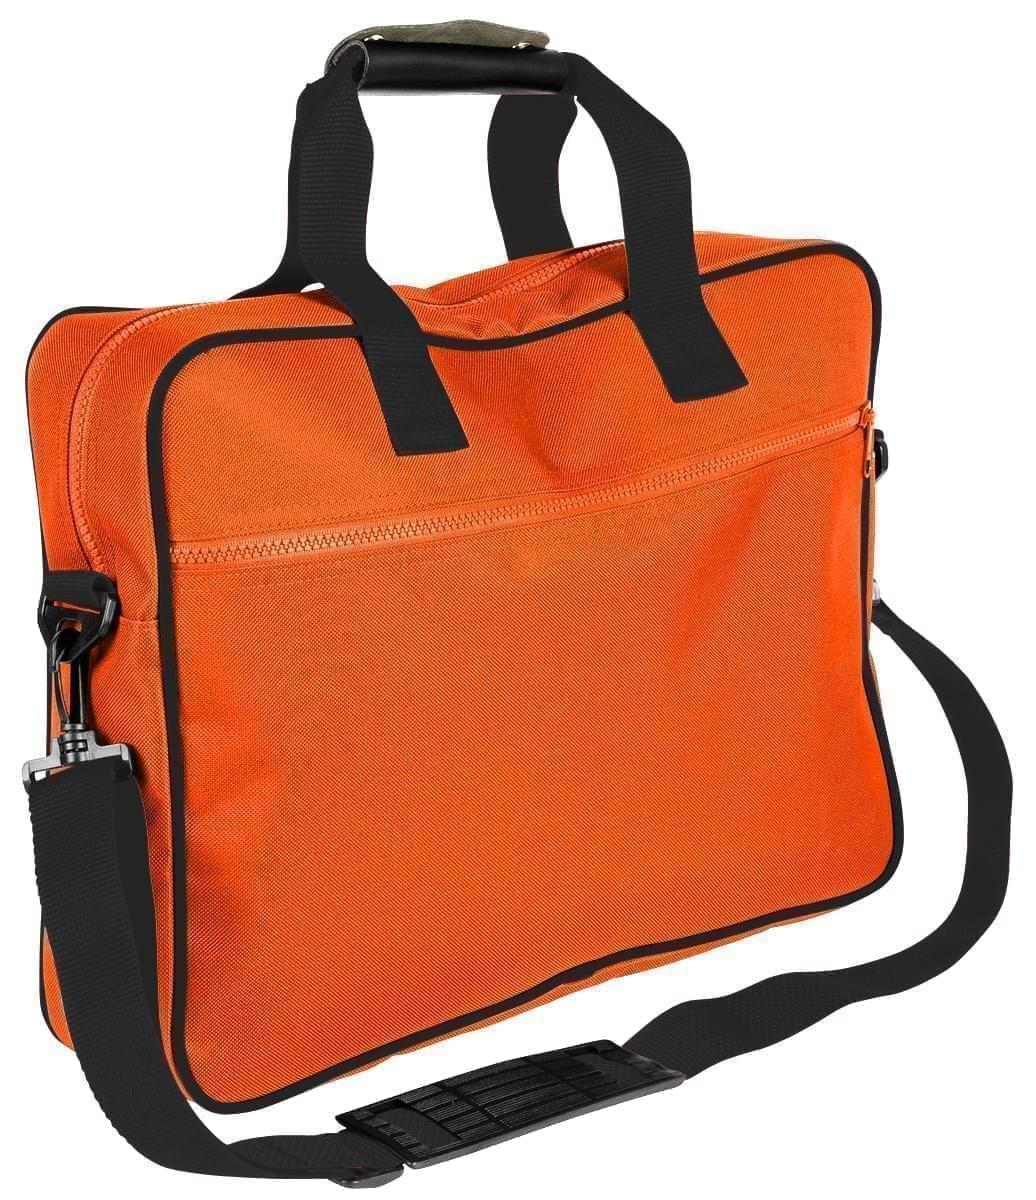 USA Made Nylon Poly Notebook Sleeves, Orange-Black, CPKVA59PXR